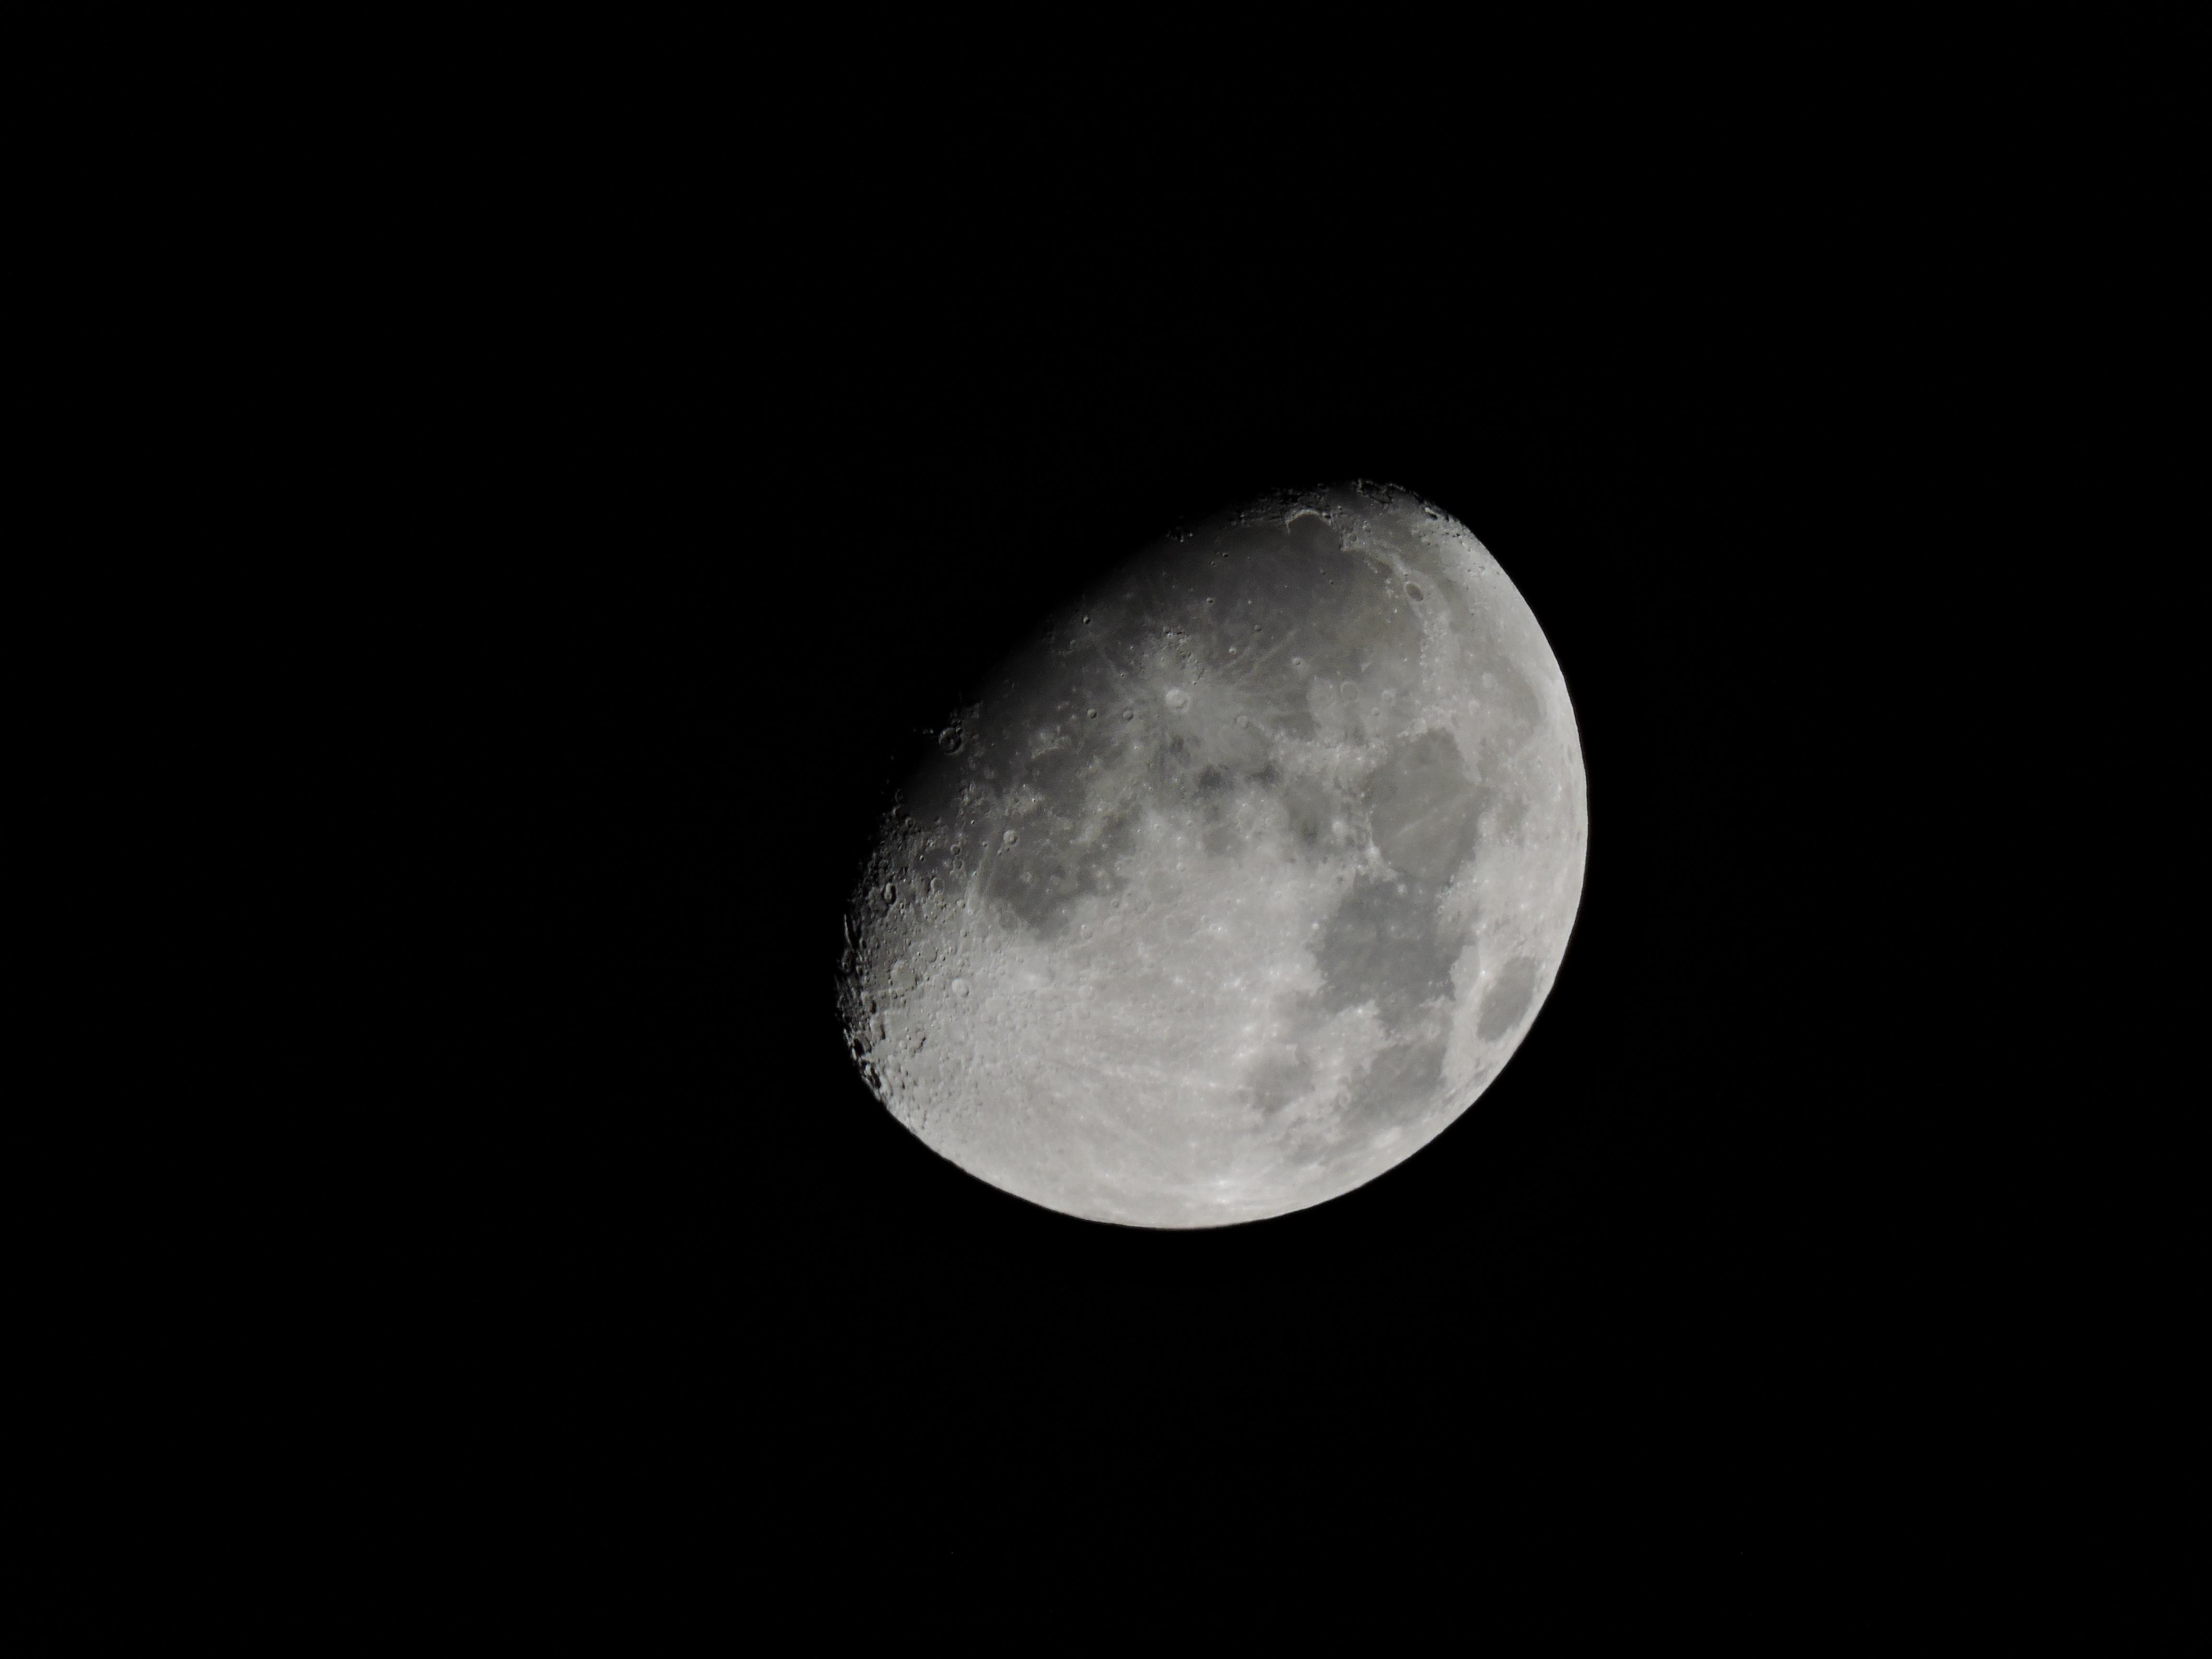 Black Wallpaper Iphone 6 Free Stock Photo Of Black And White Dark Moon